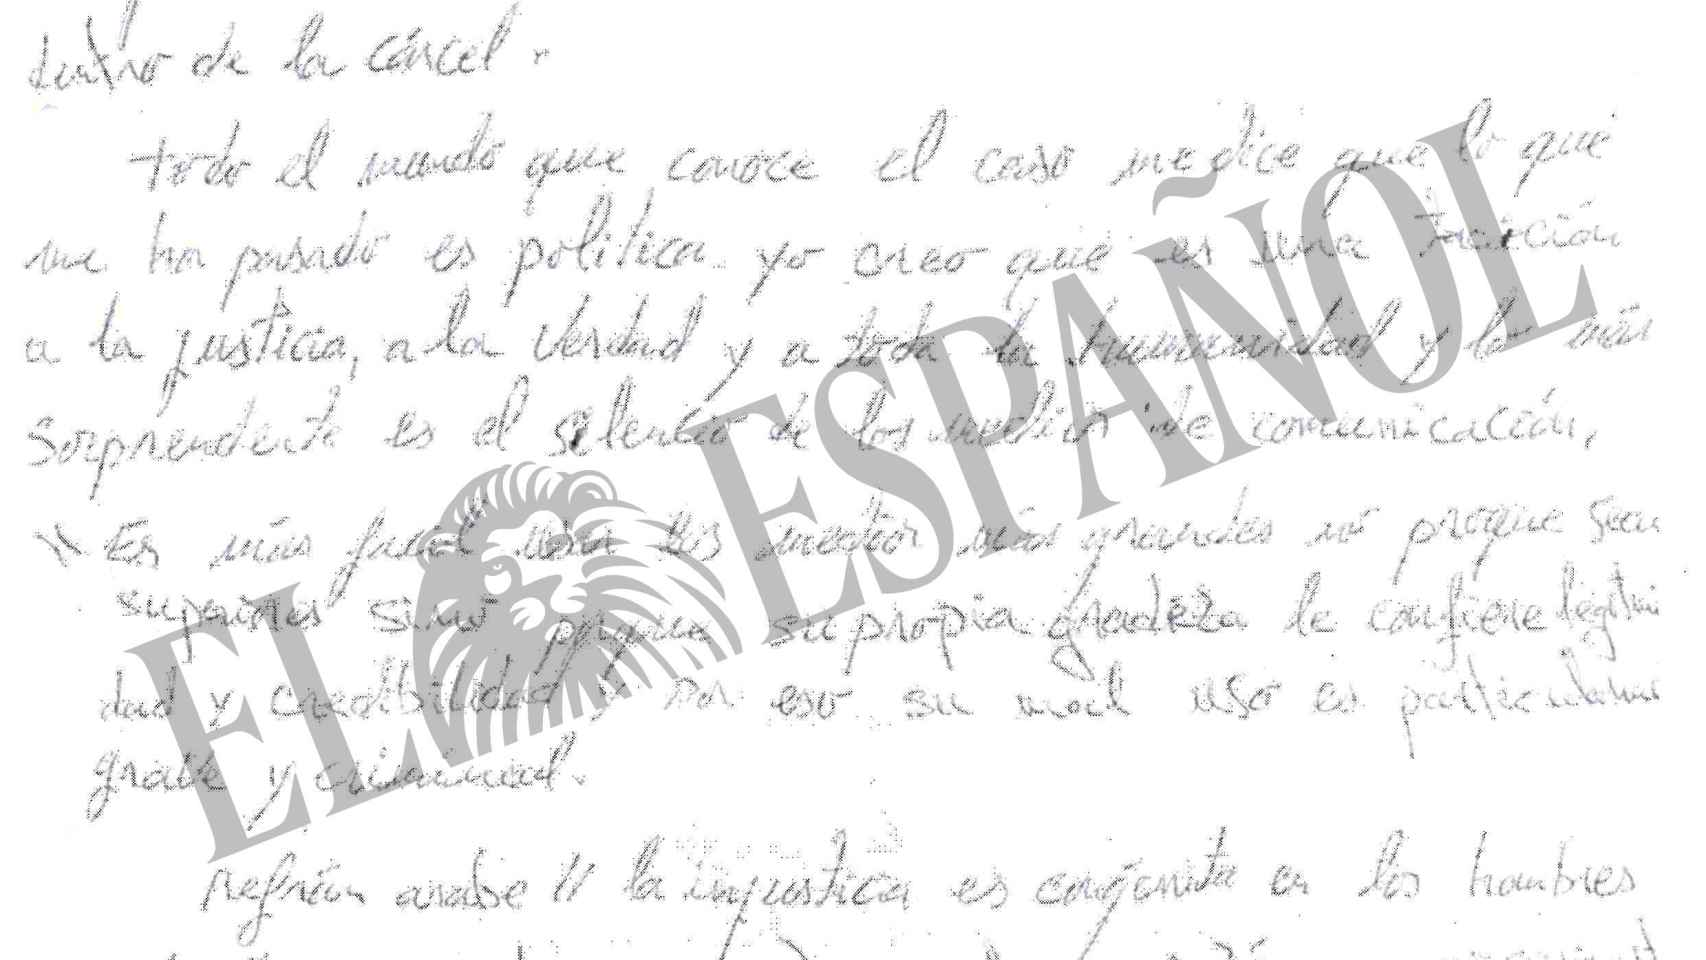 Fragmento de la carta de Zougam